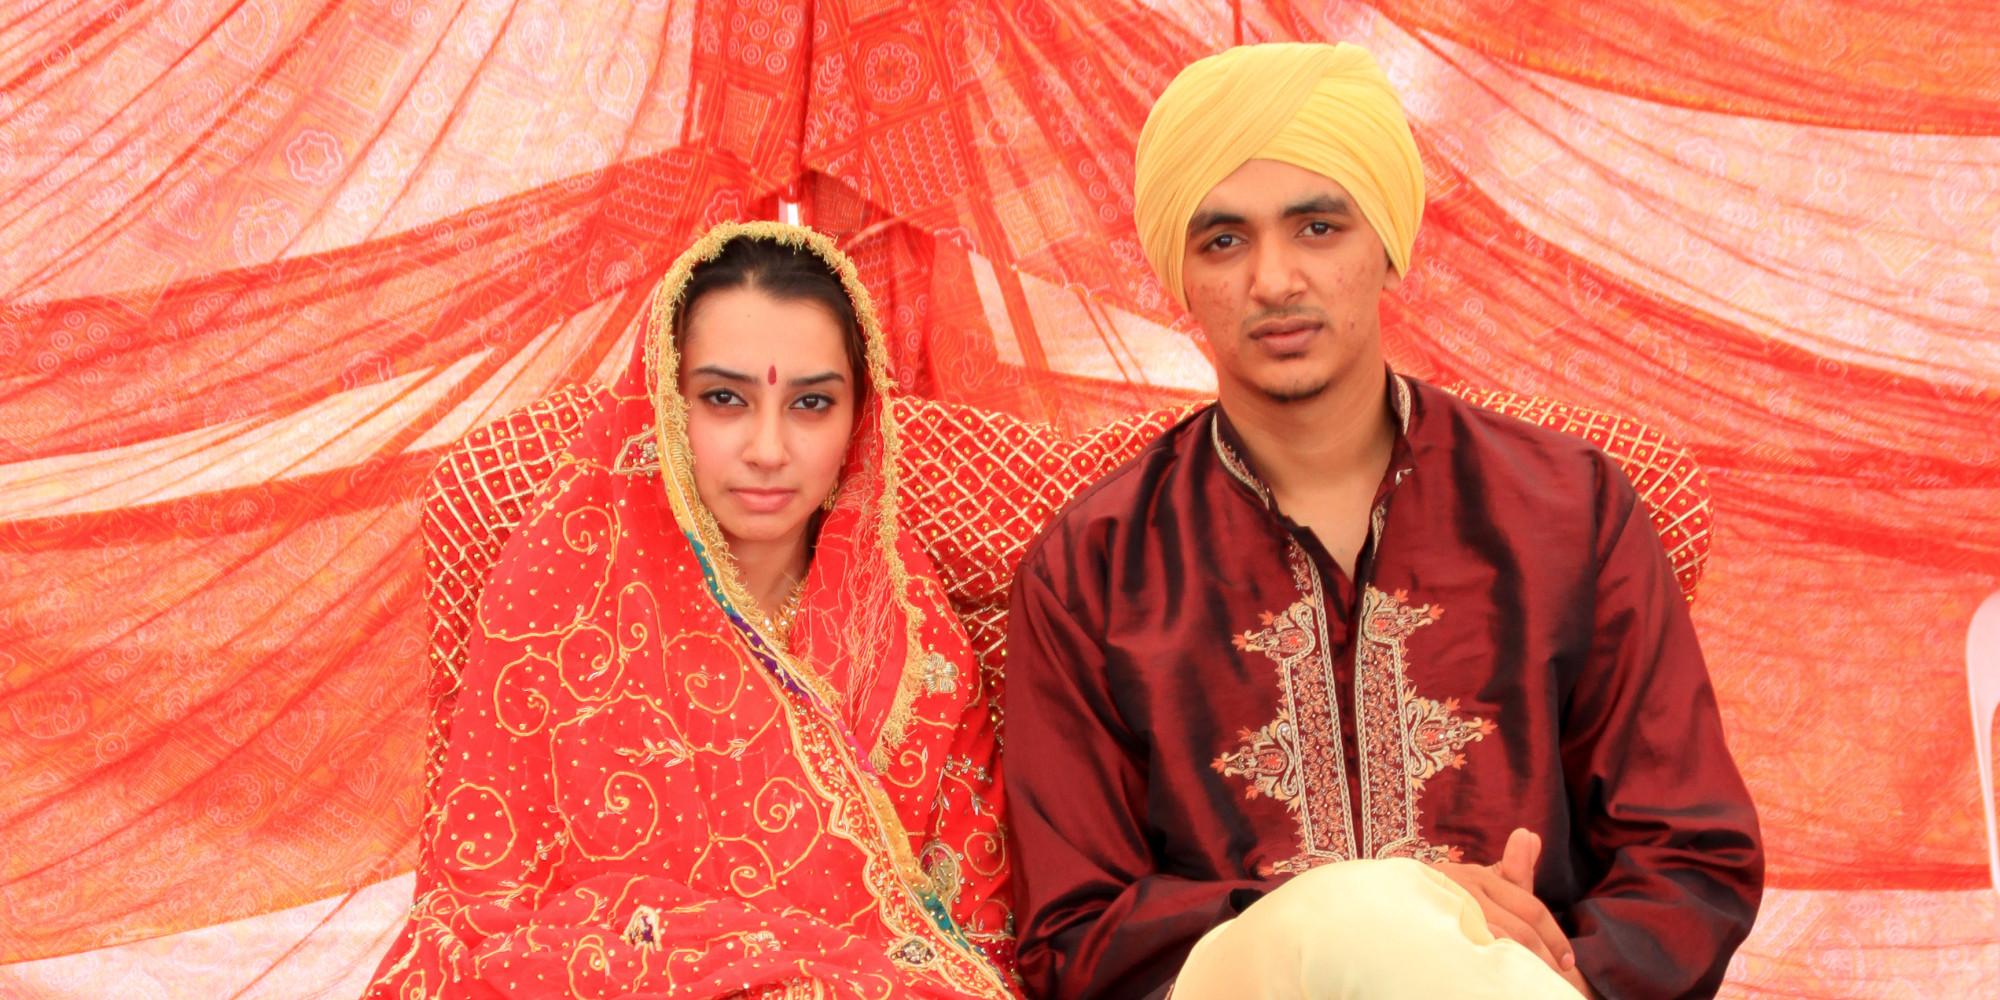 Nairobi indian wedding